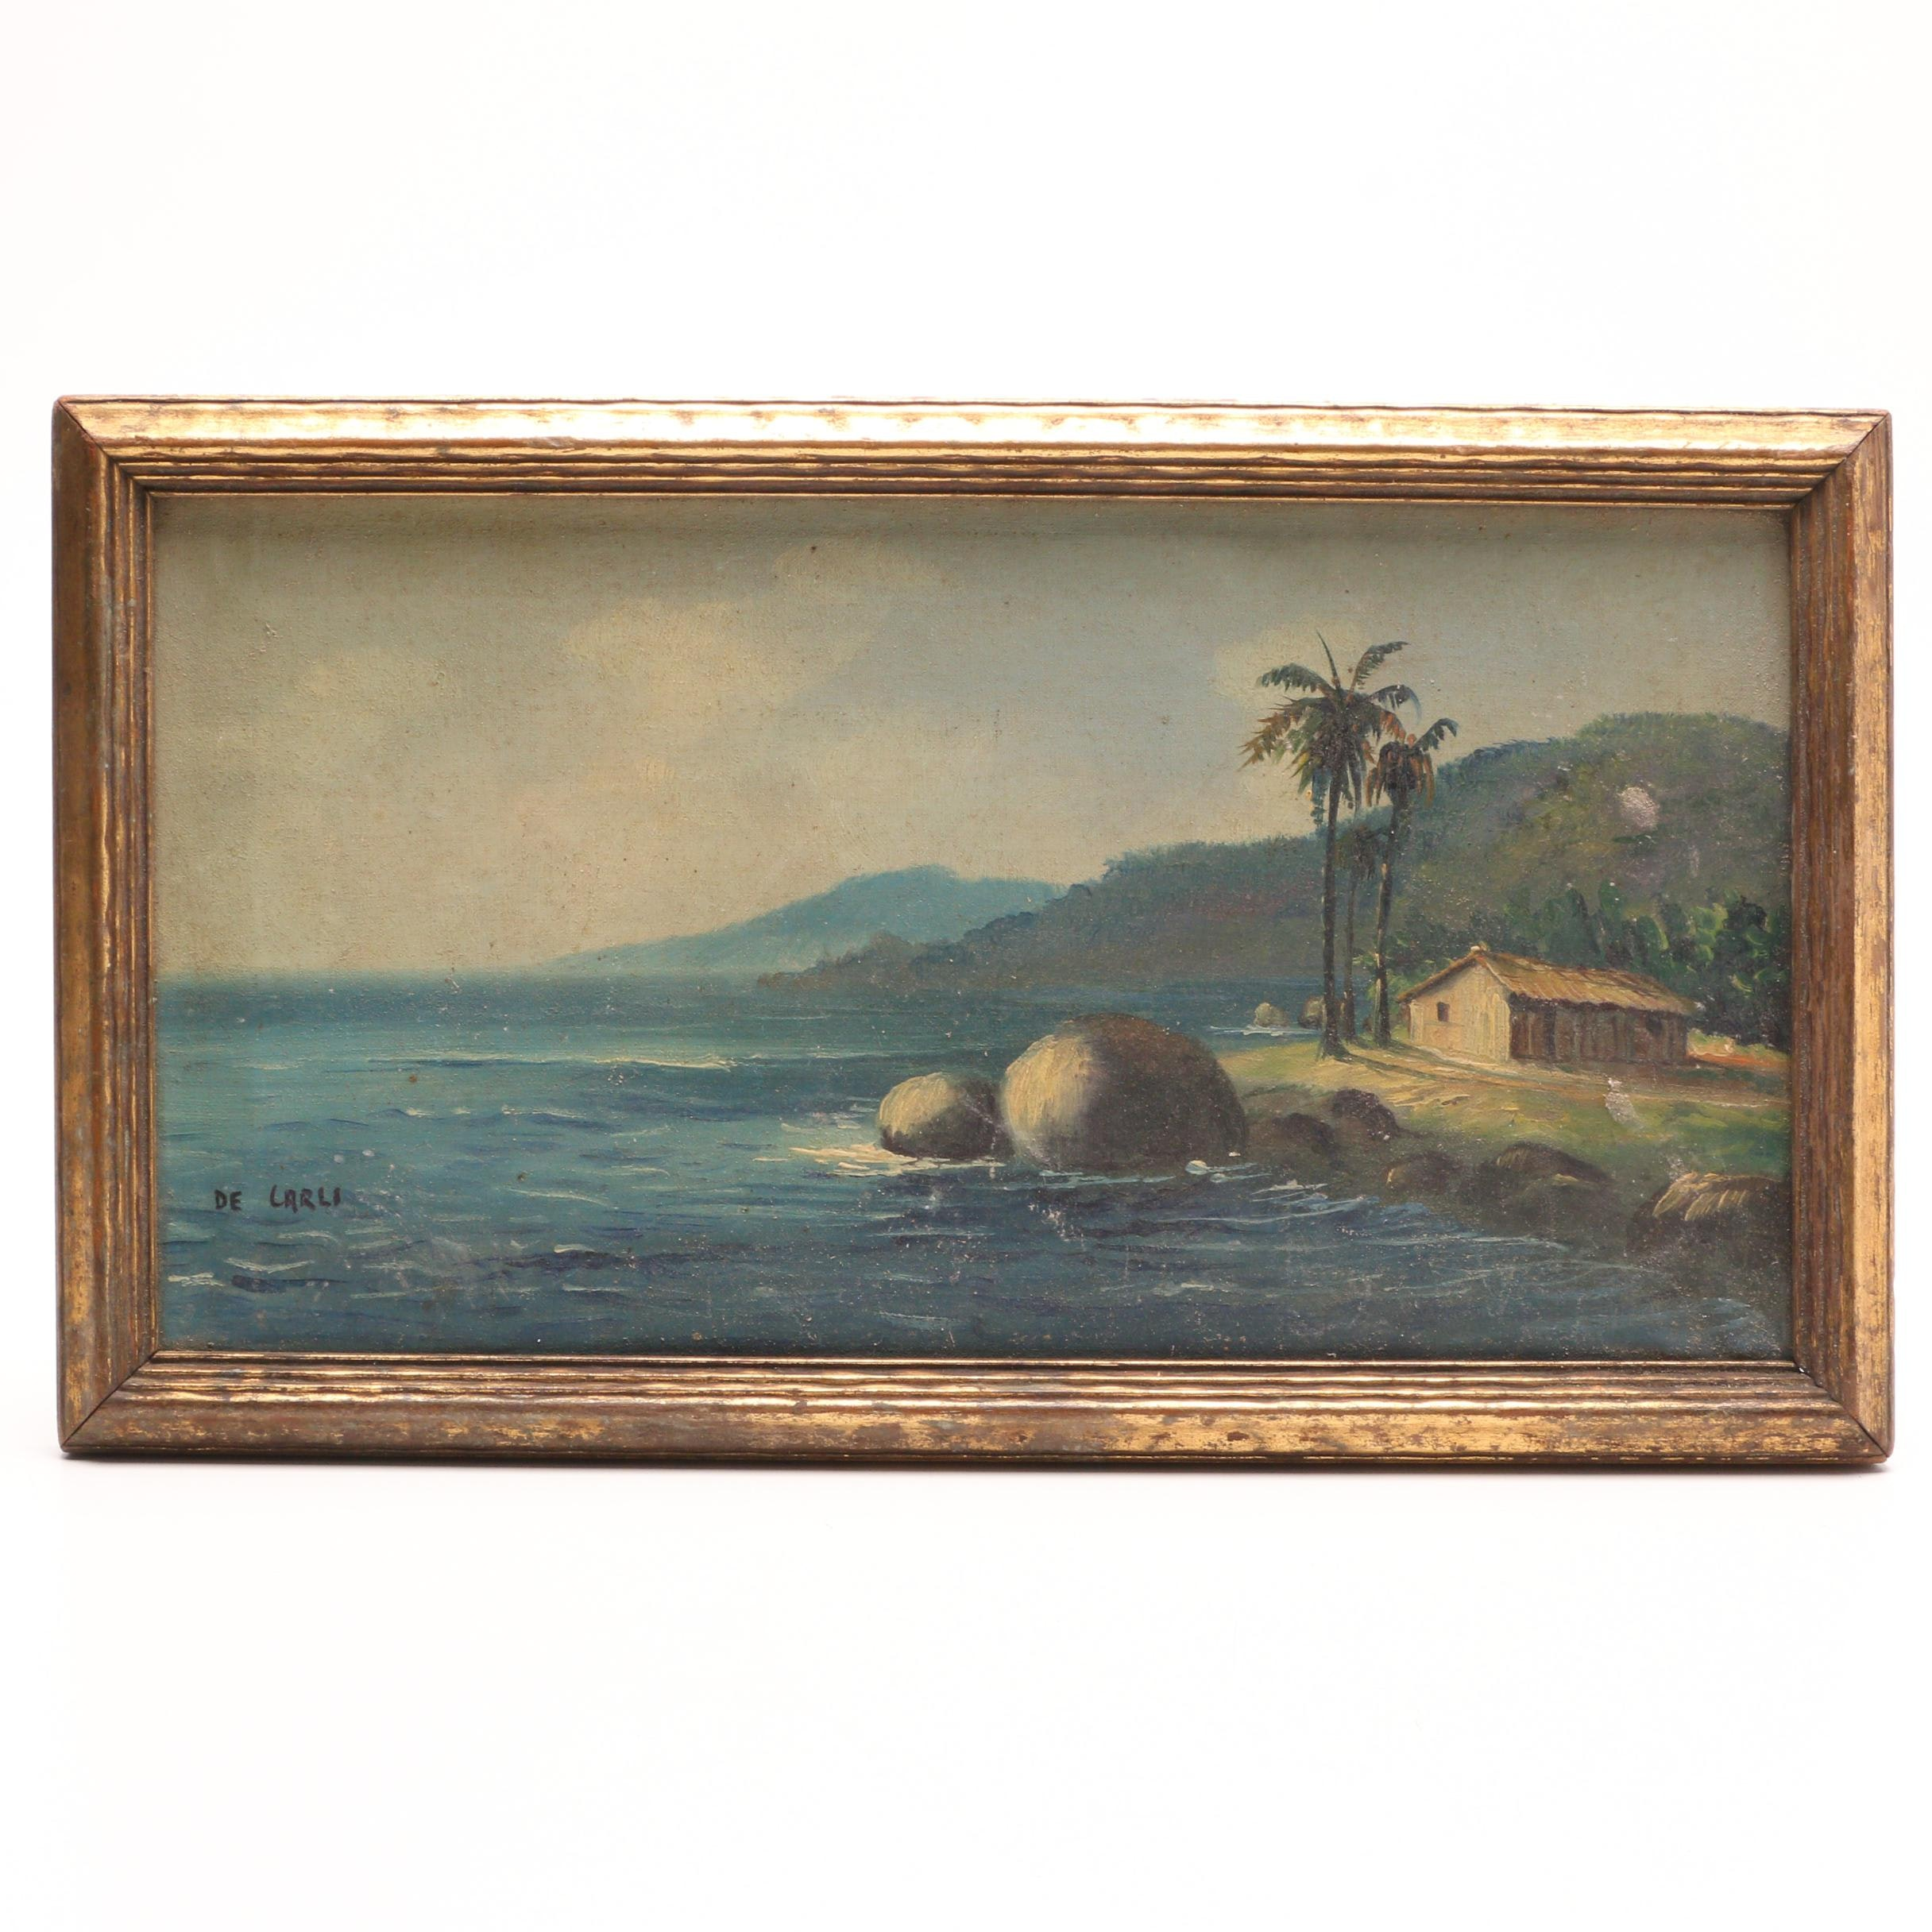 De Carli Oil Painting of Tropical Coastal Scene